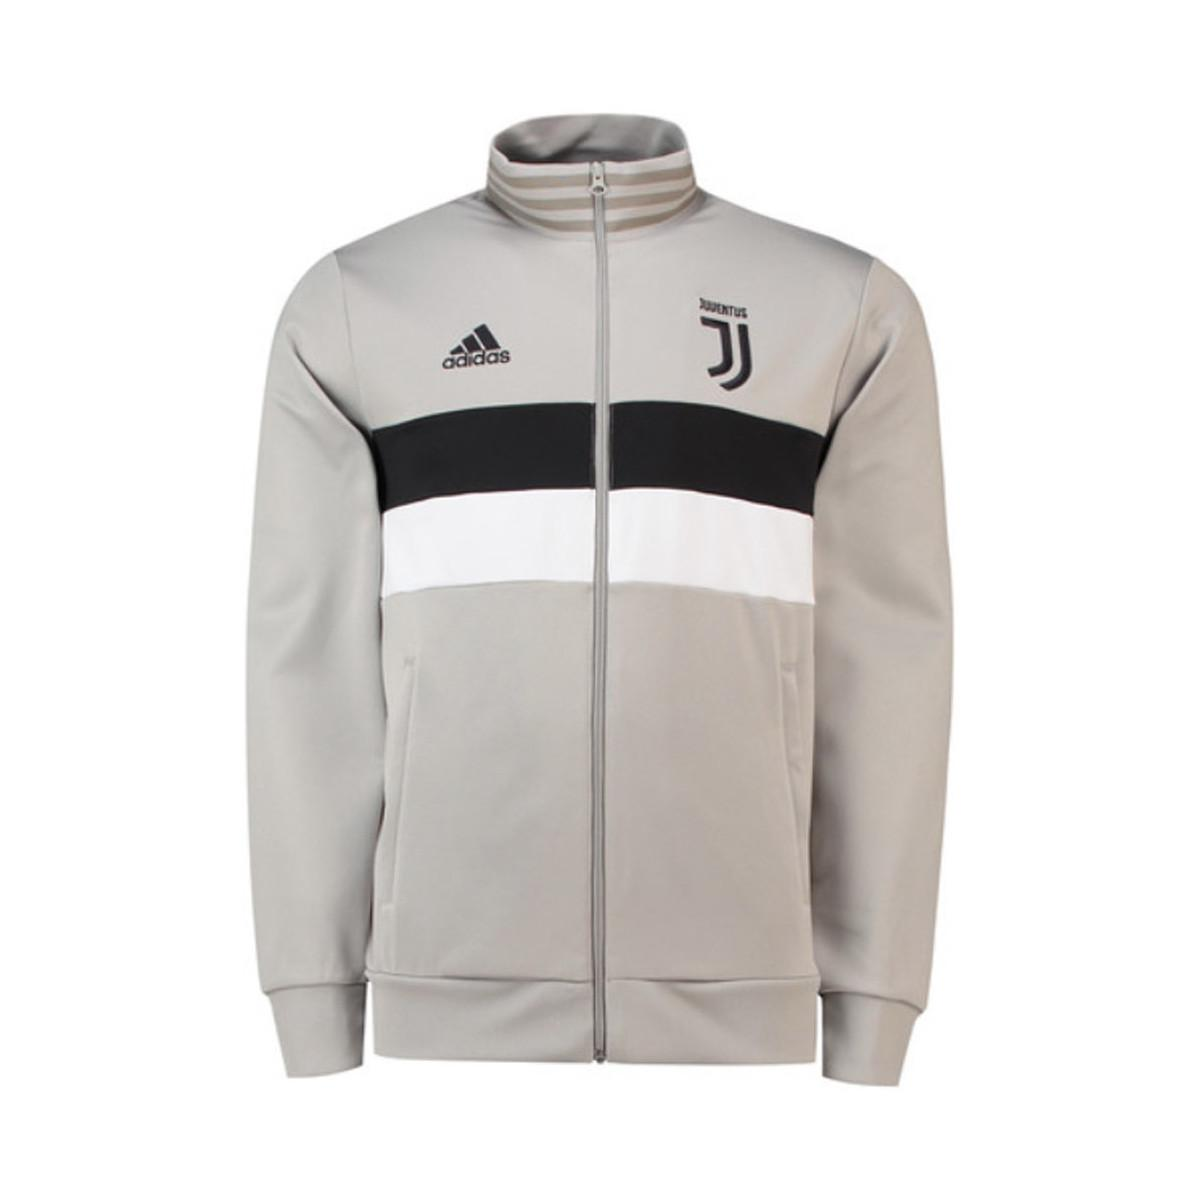 adidas 2018-2019 Juventus 3s Track Top (sesame) Women s Tracksuit ... 3ba991c8a3